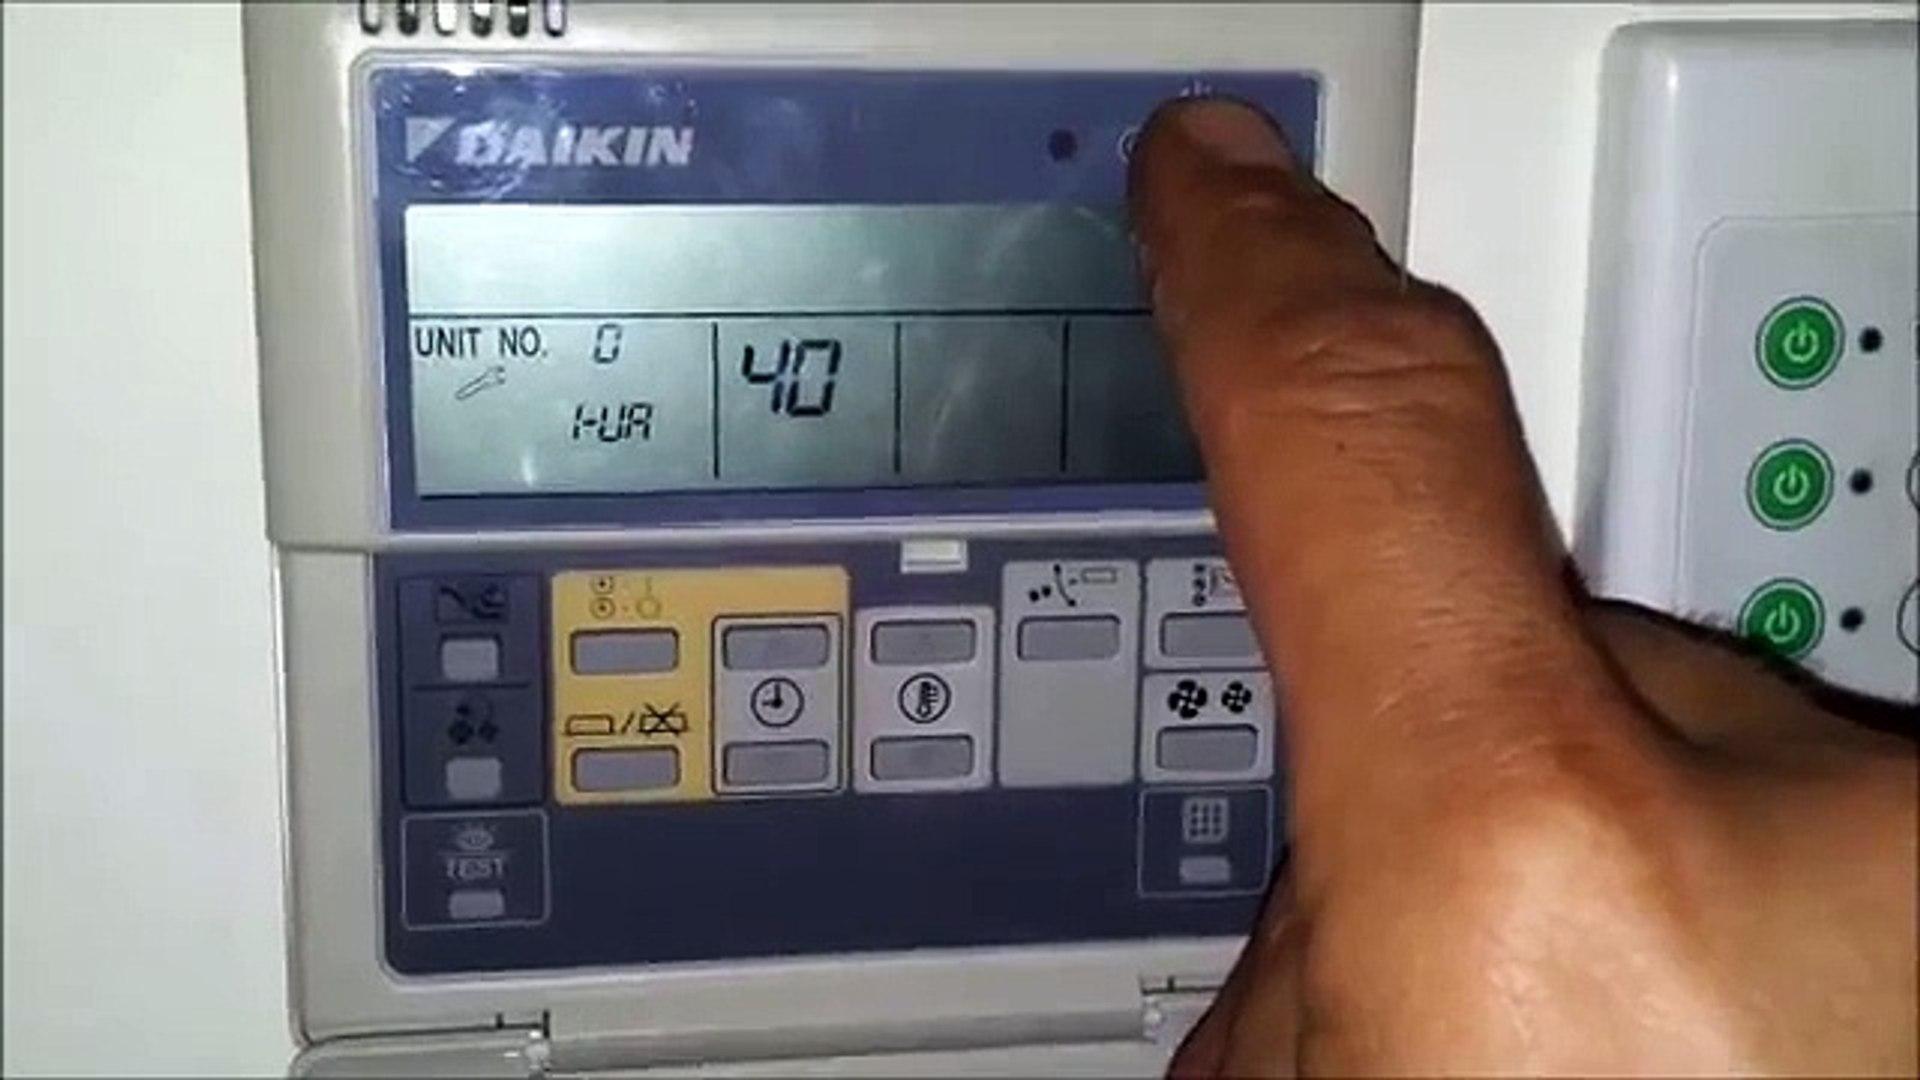 Daikin AC wall control reset, does not reset